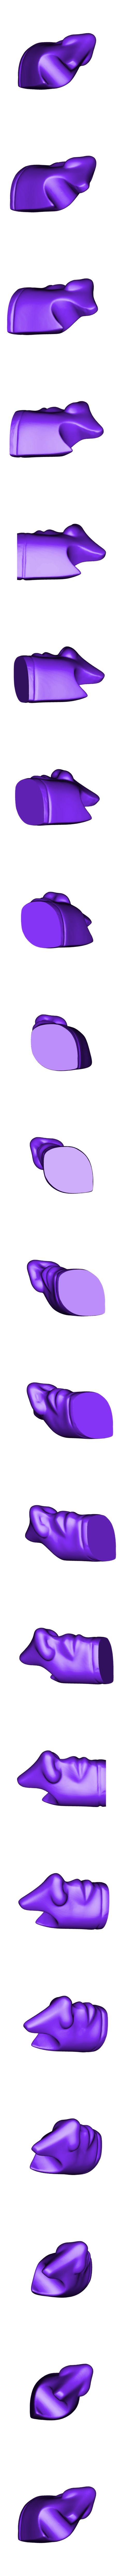 suporte_oculos.stl Download free STL file Nose Glasses Support • 3D printer object, 3Delivery